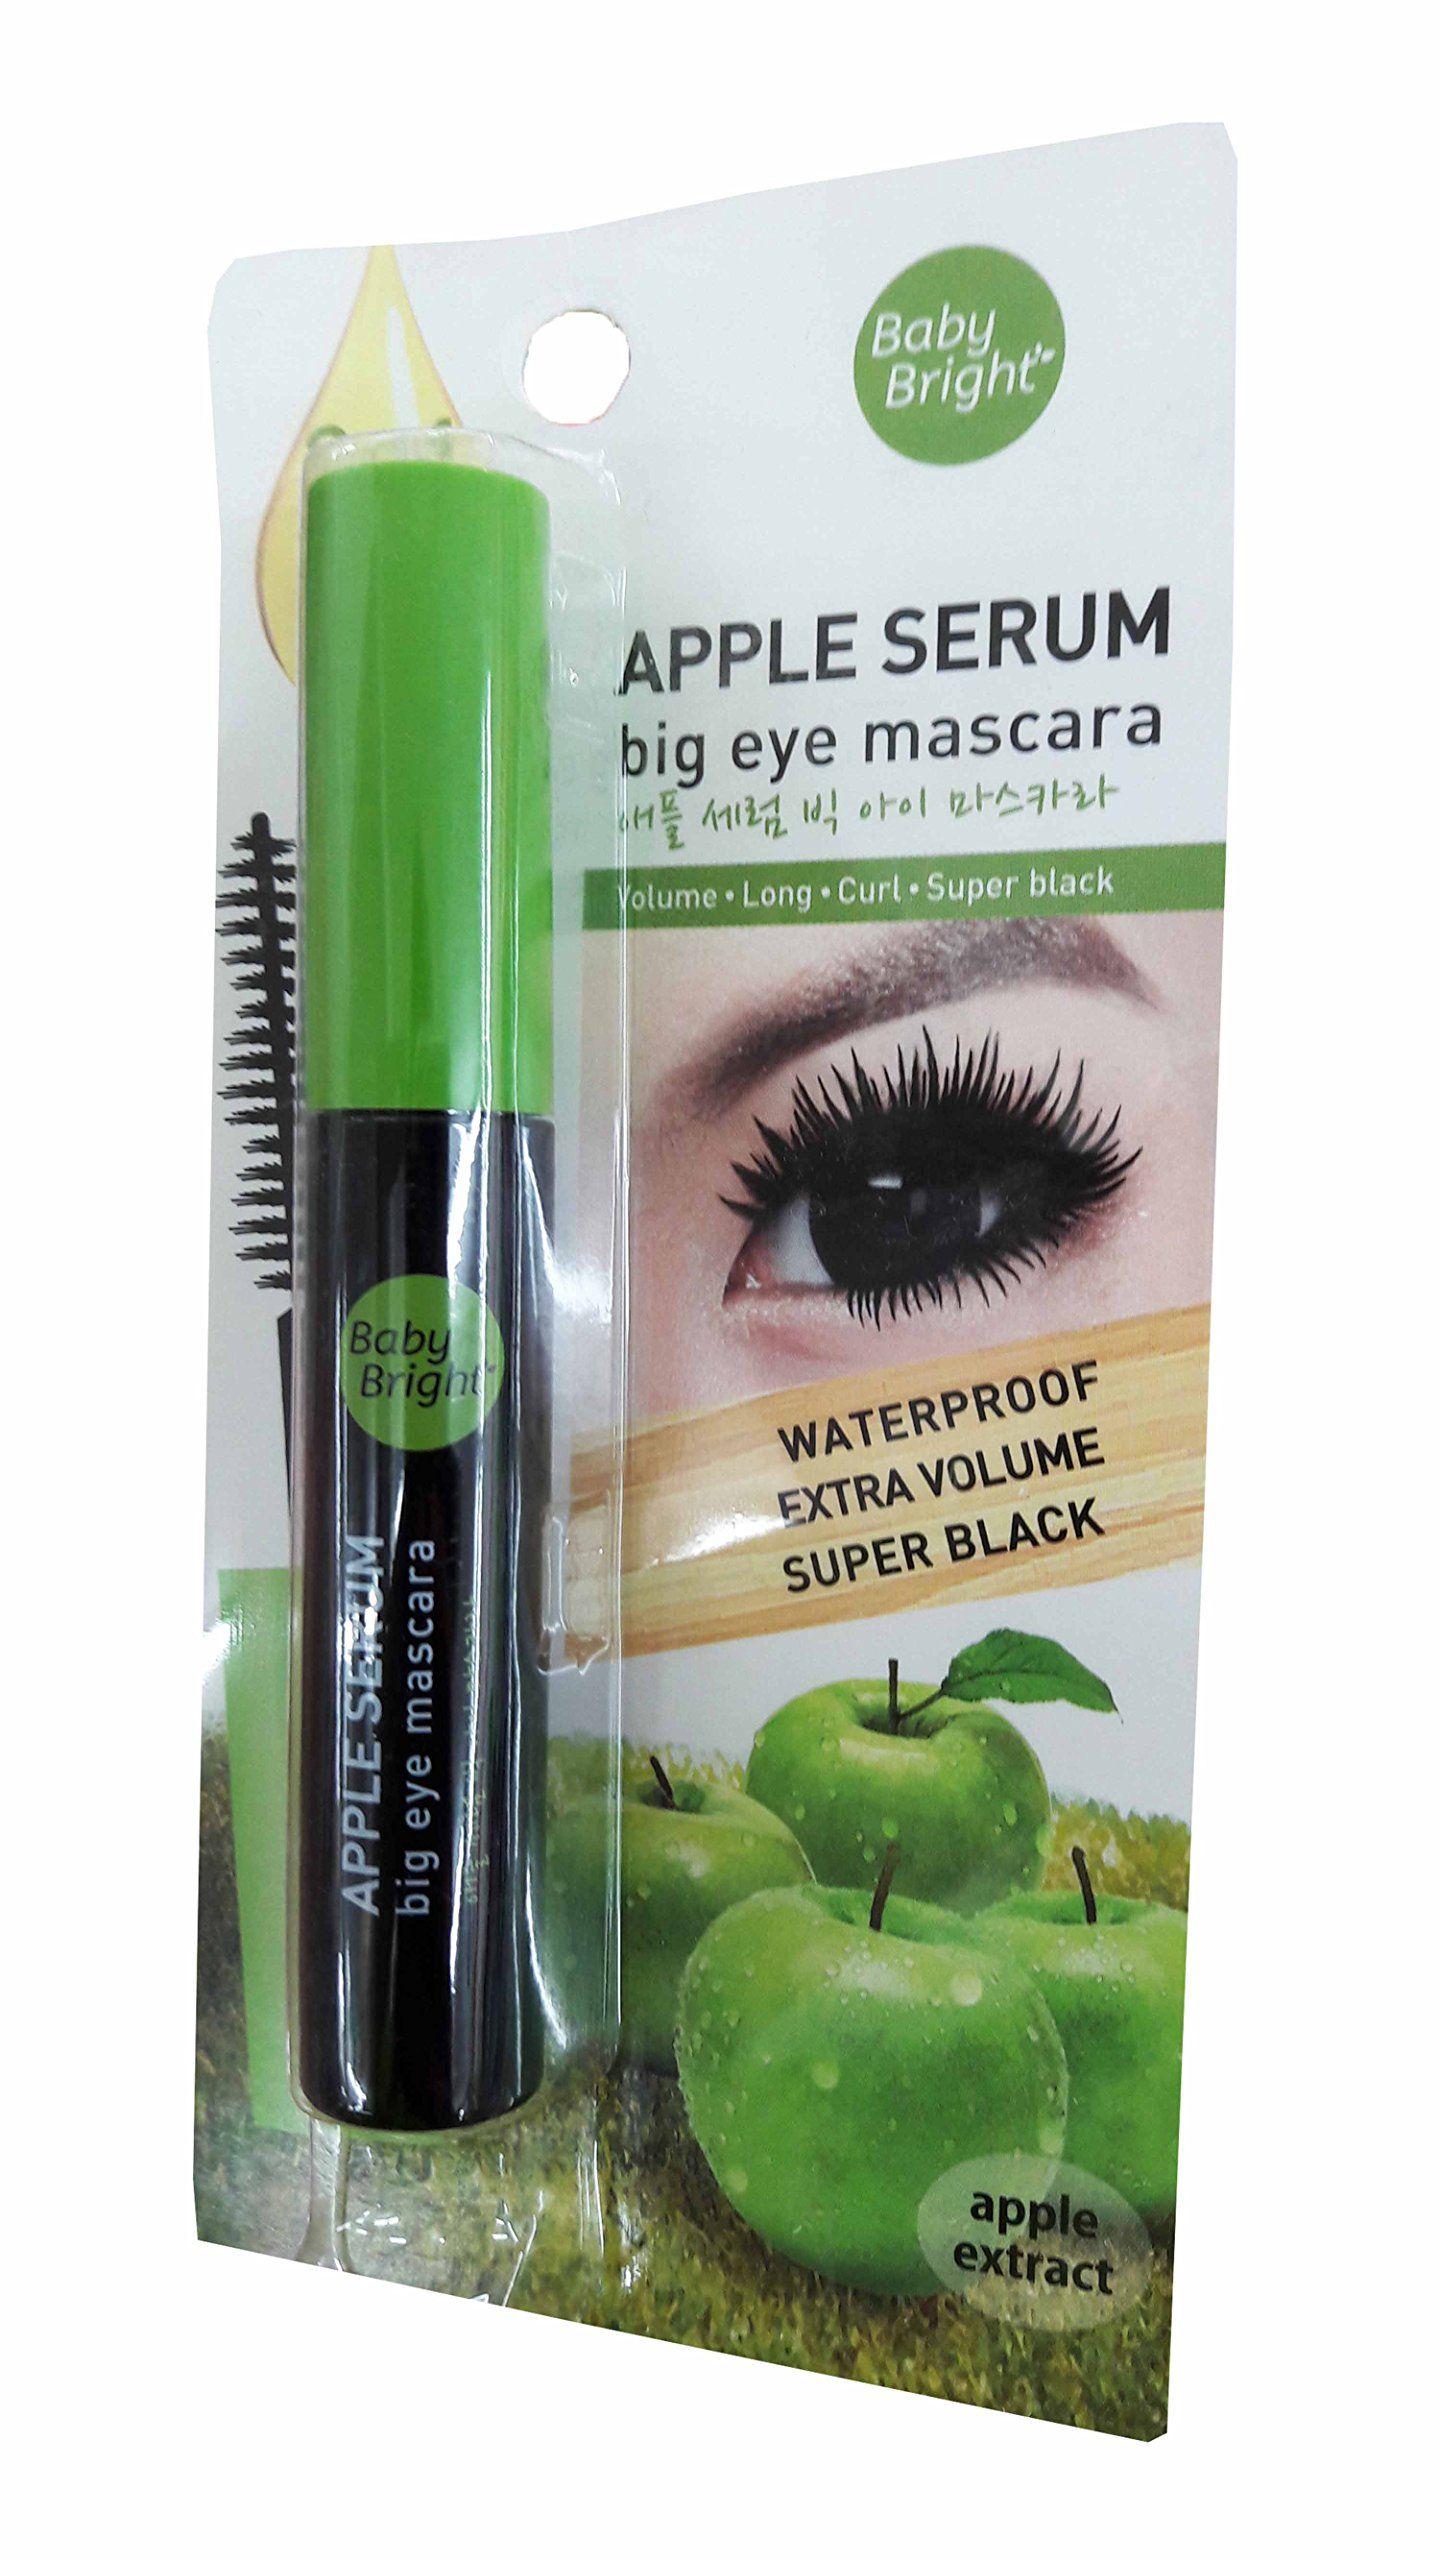 2 packs of Baby Bright Apple Serum Big Eye Mascara